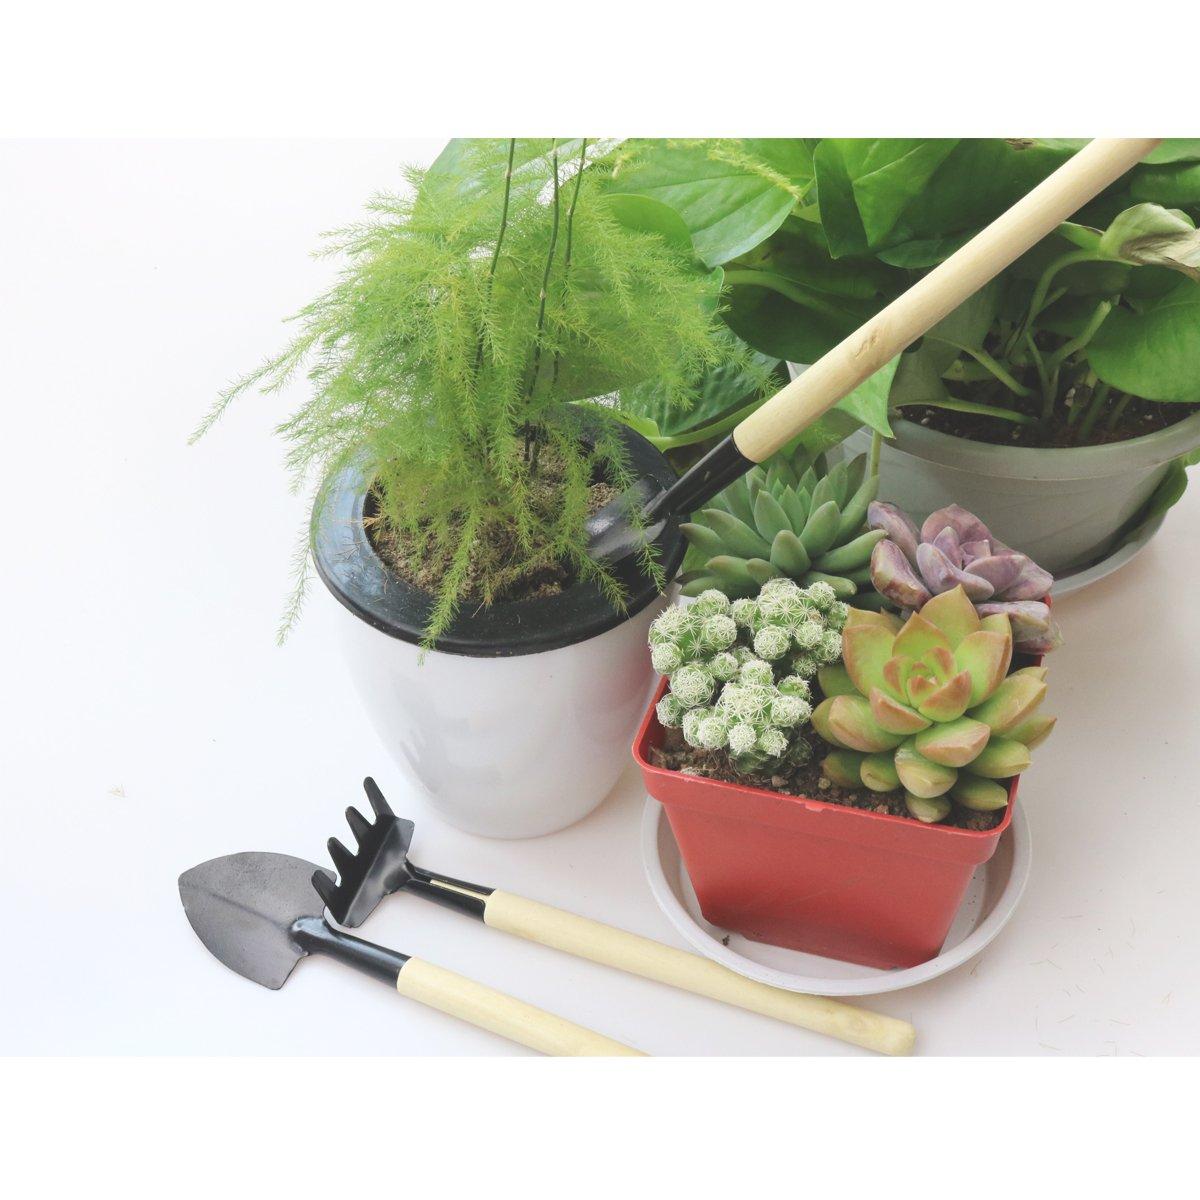 ZELAR MADE Bonsai Set 8 Pcs - Include Pruner,Fold Scissors,Mini Rake,Bud & Leaf Trimmer Set